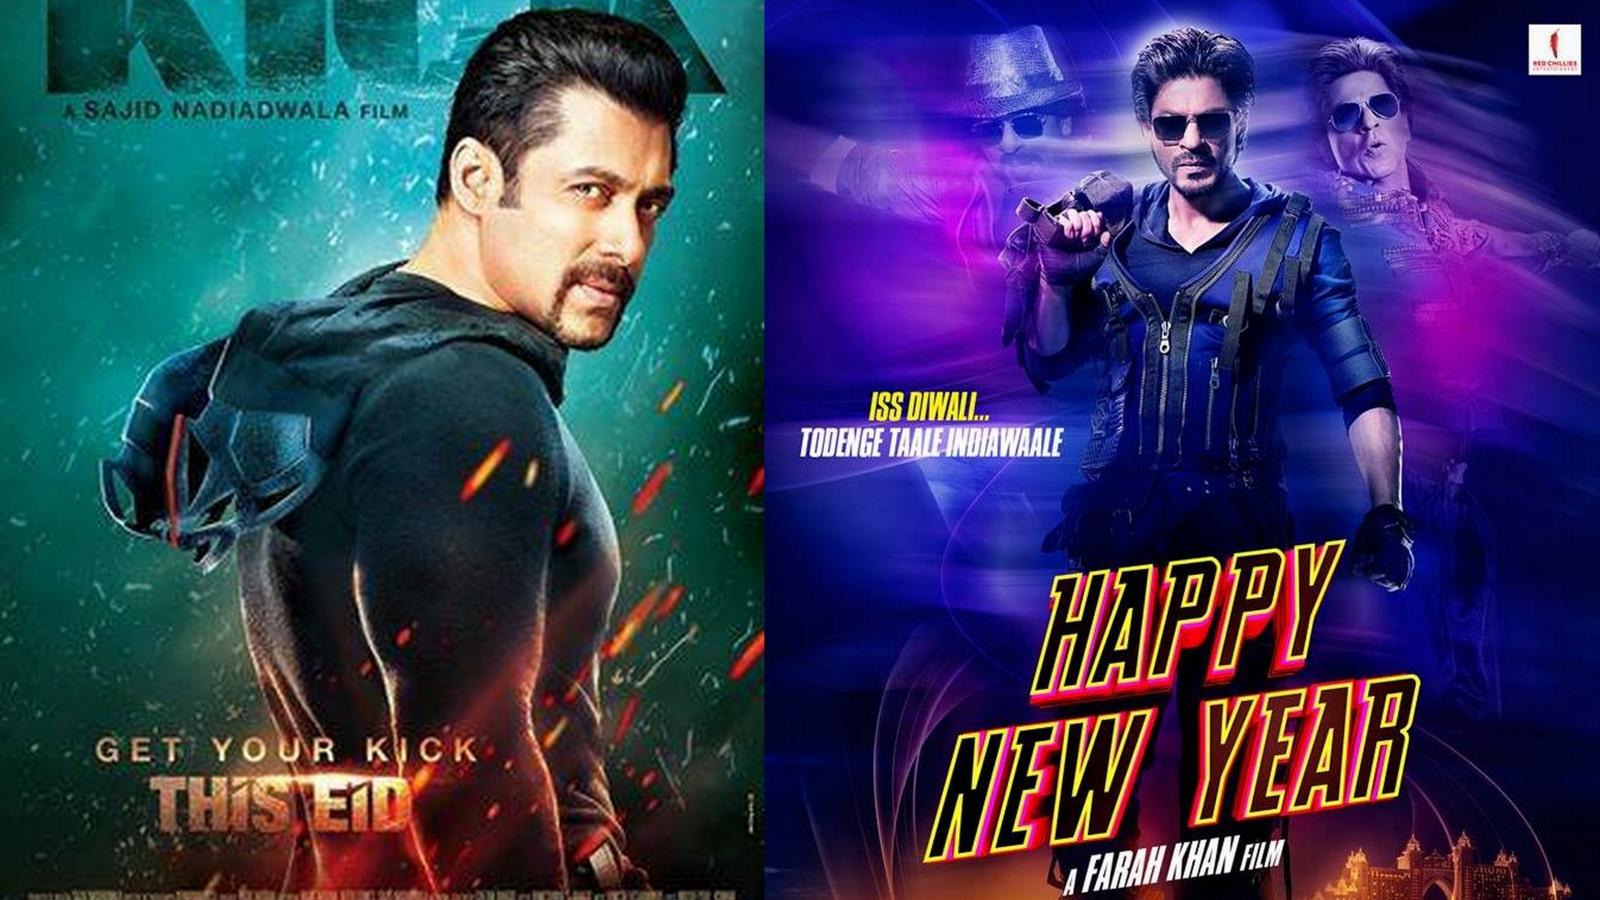 Sharukhkhan new movie